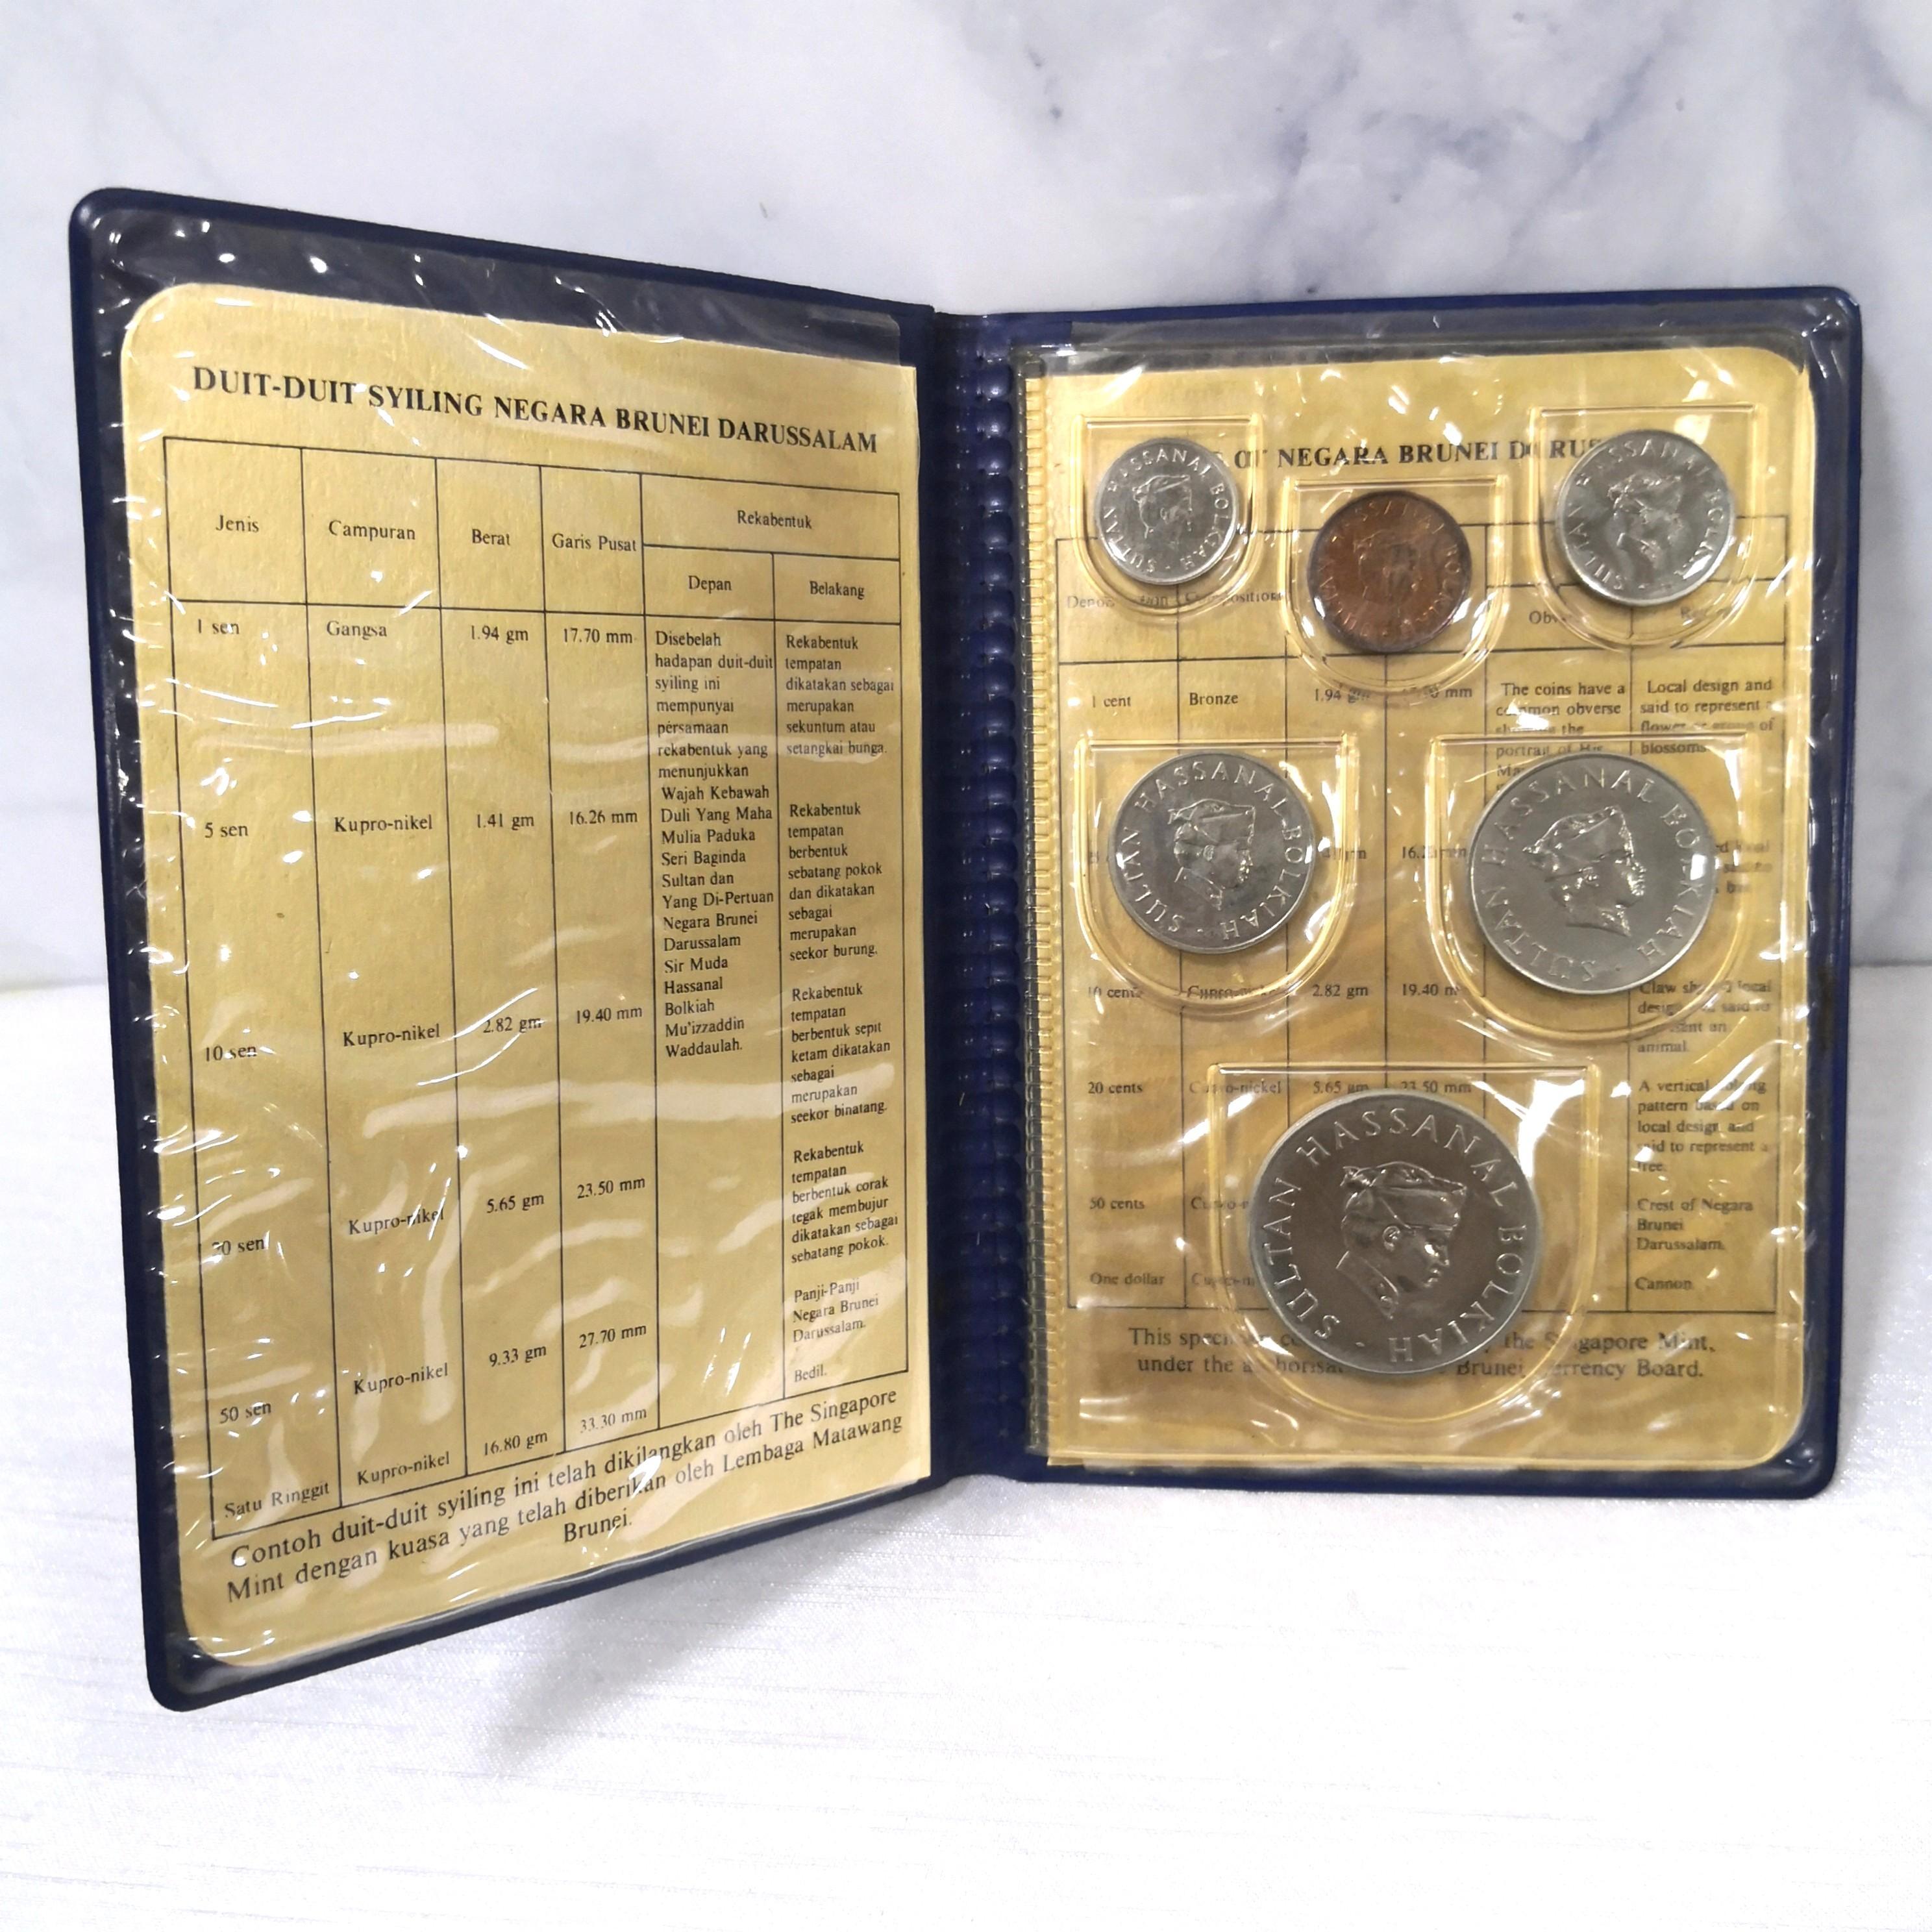 1984 Brunei Darussalam Uncirculated Specimen coin set